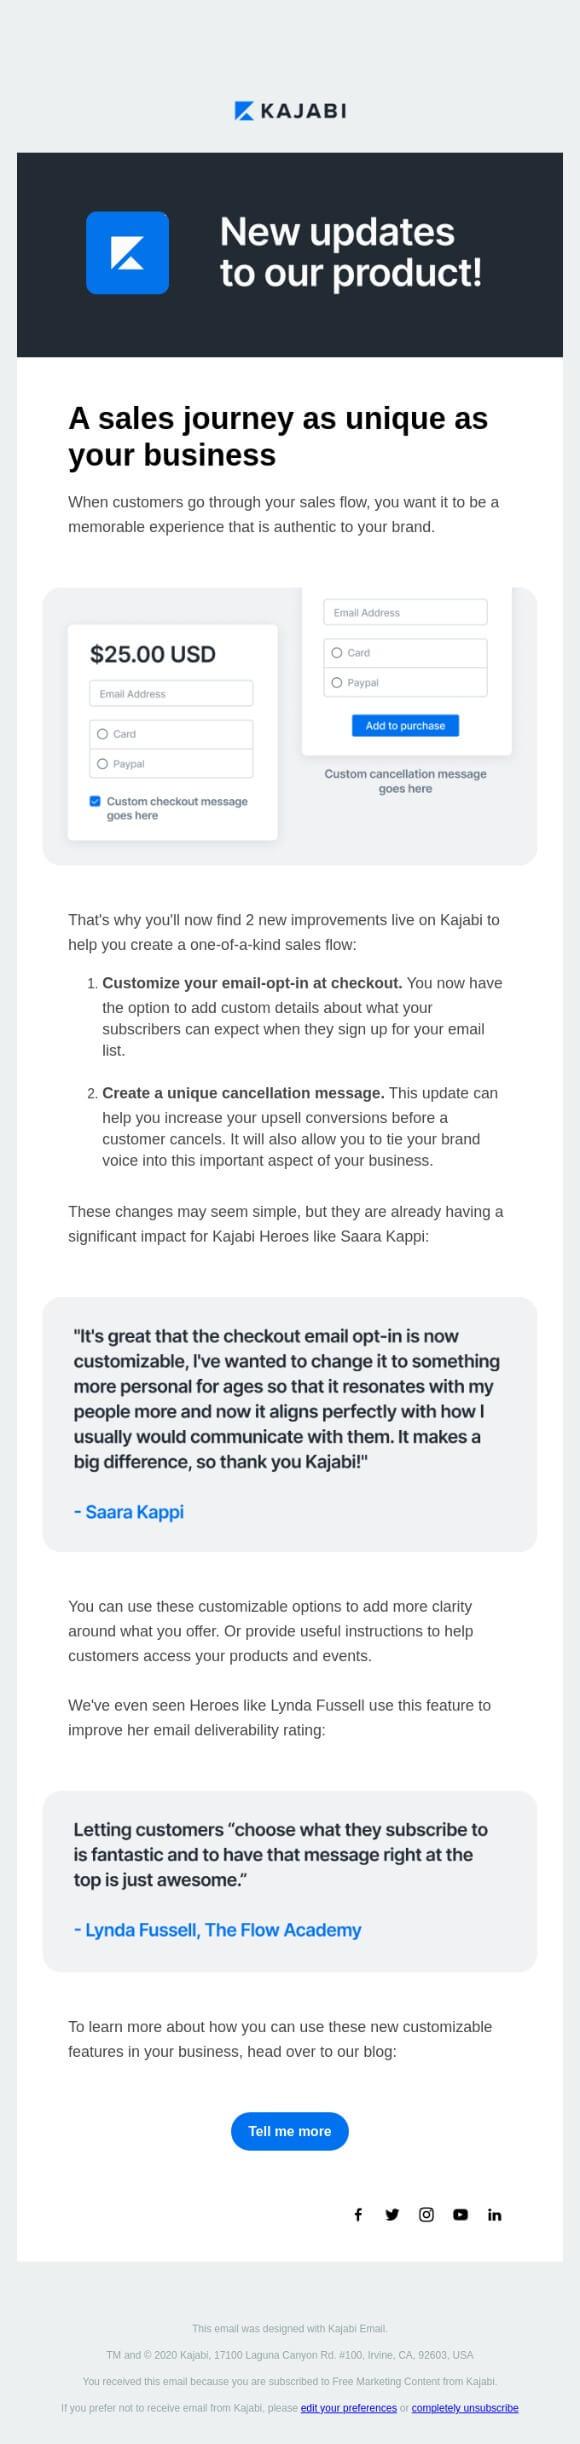 product-update-emails-kajabi